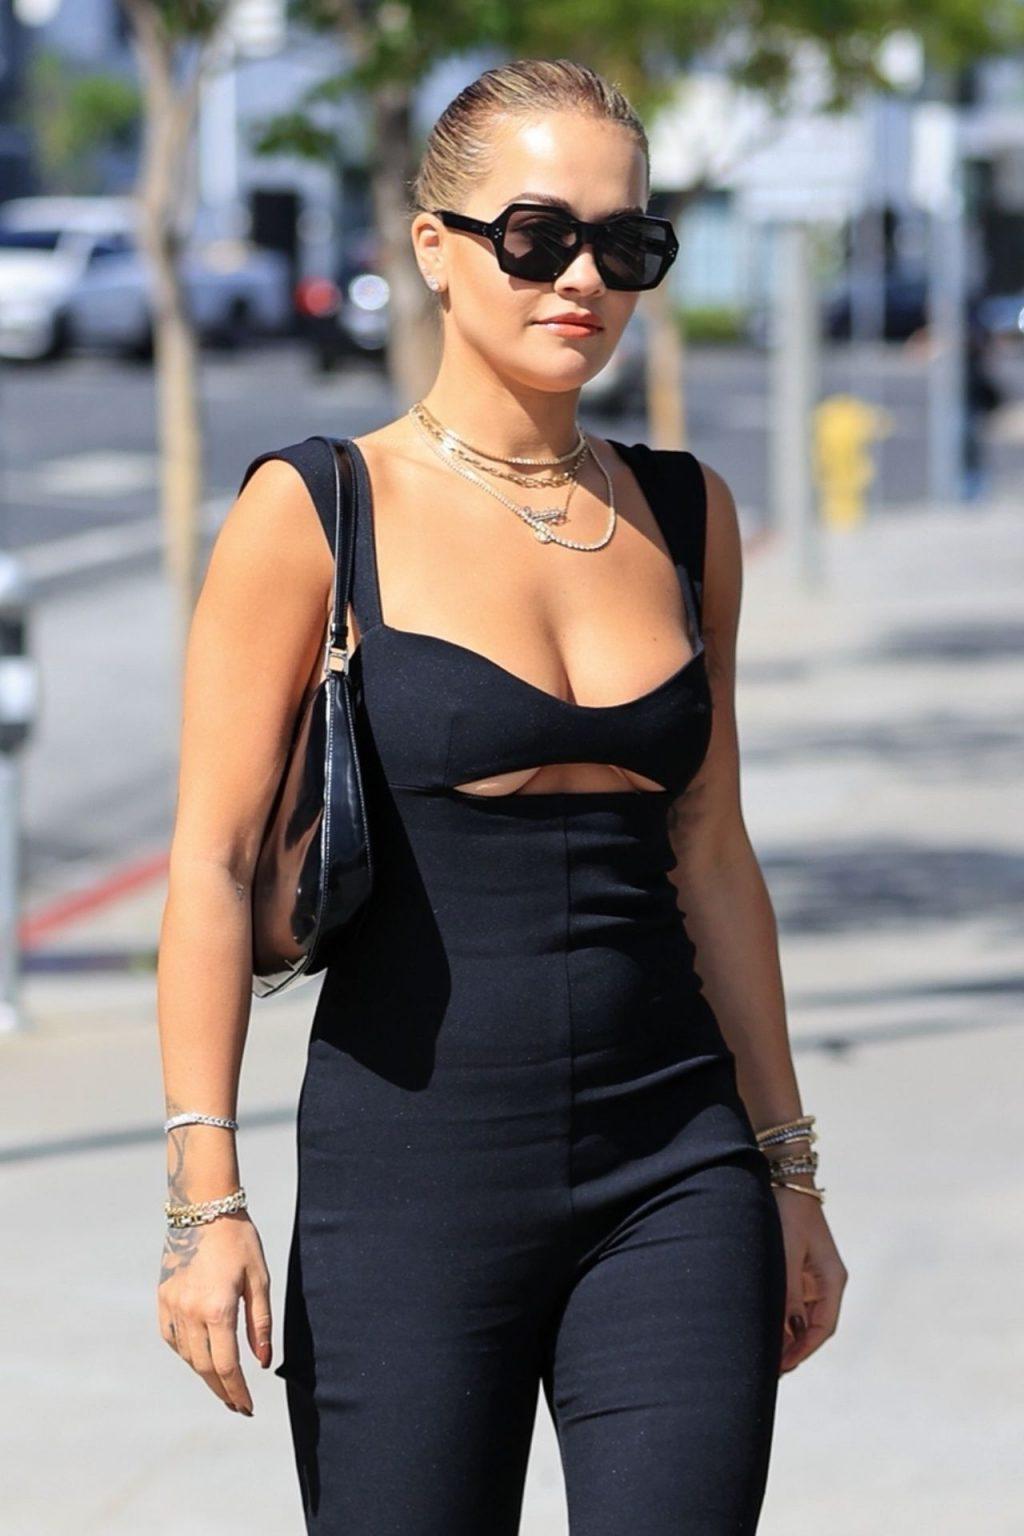 Rita Ora Mesmerizes Once Again Heading to a Business Meeting (54 Photos)